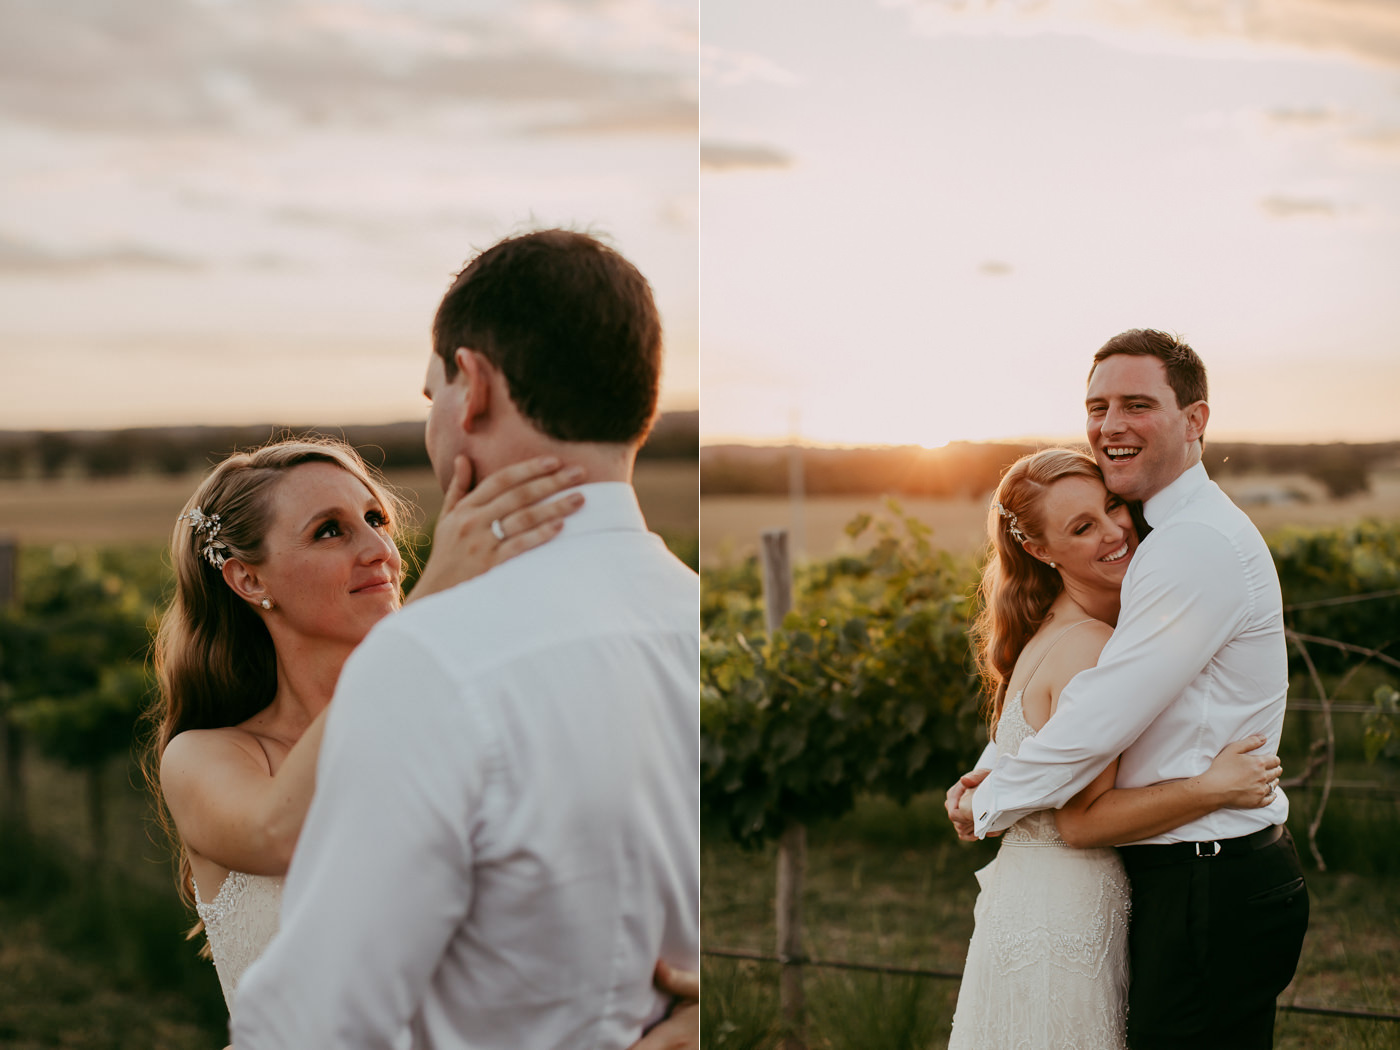 Anthony & Eliet - Wagga Wagga Wedding - Country NSW - Samantha Heather Photography-158.jpg